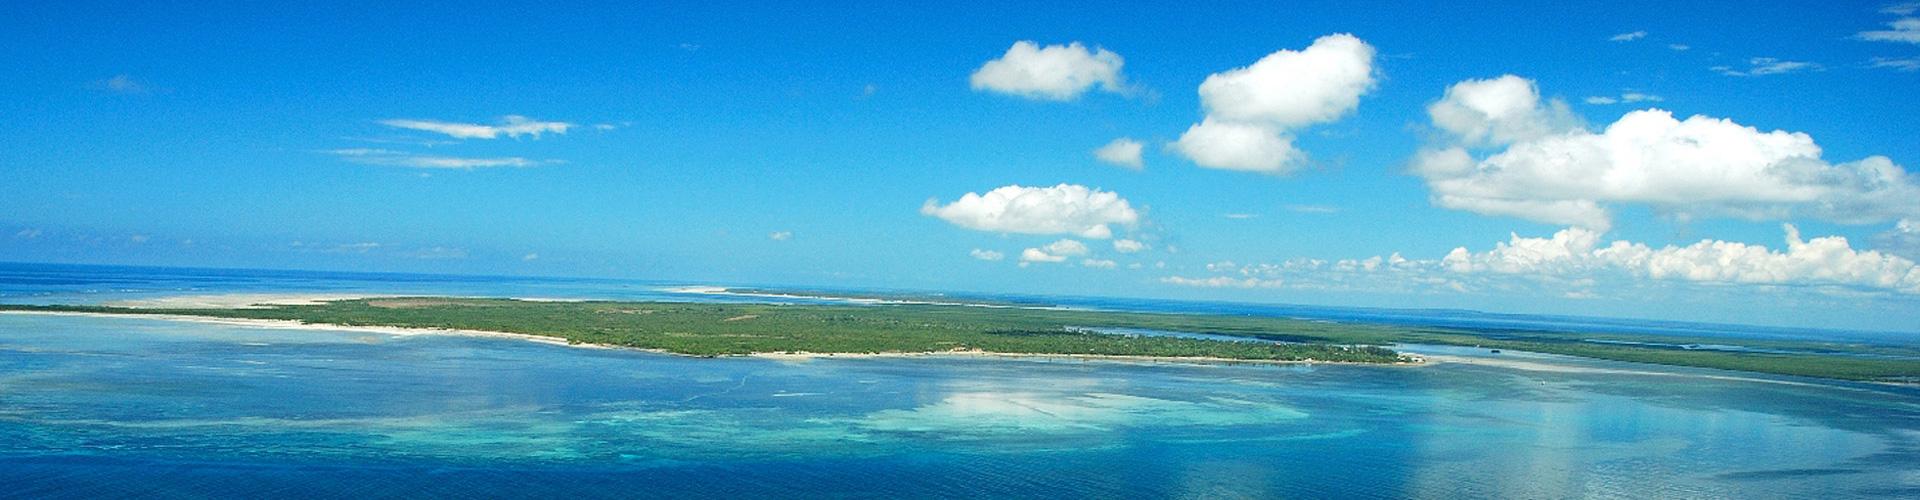 Ibo Island Aerial